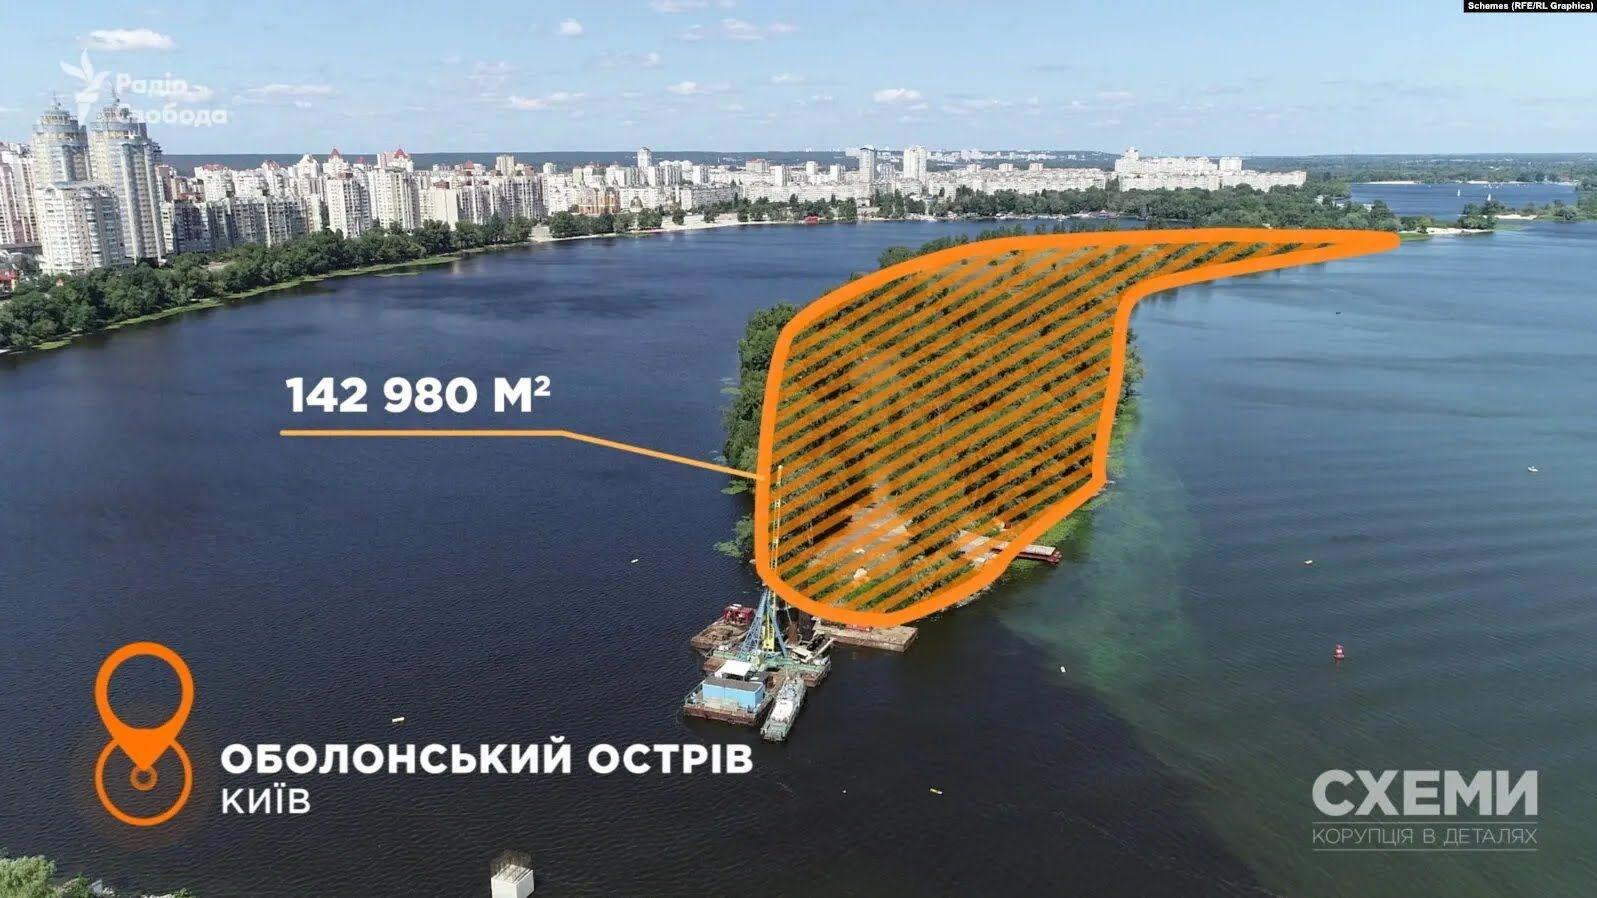 Остров на реке Днепр.